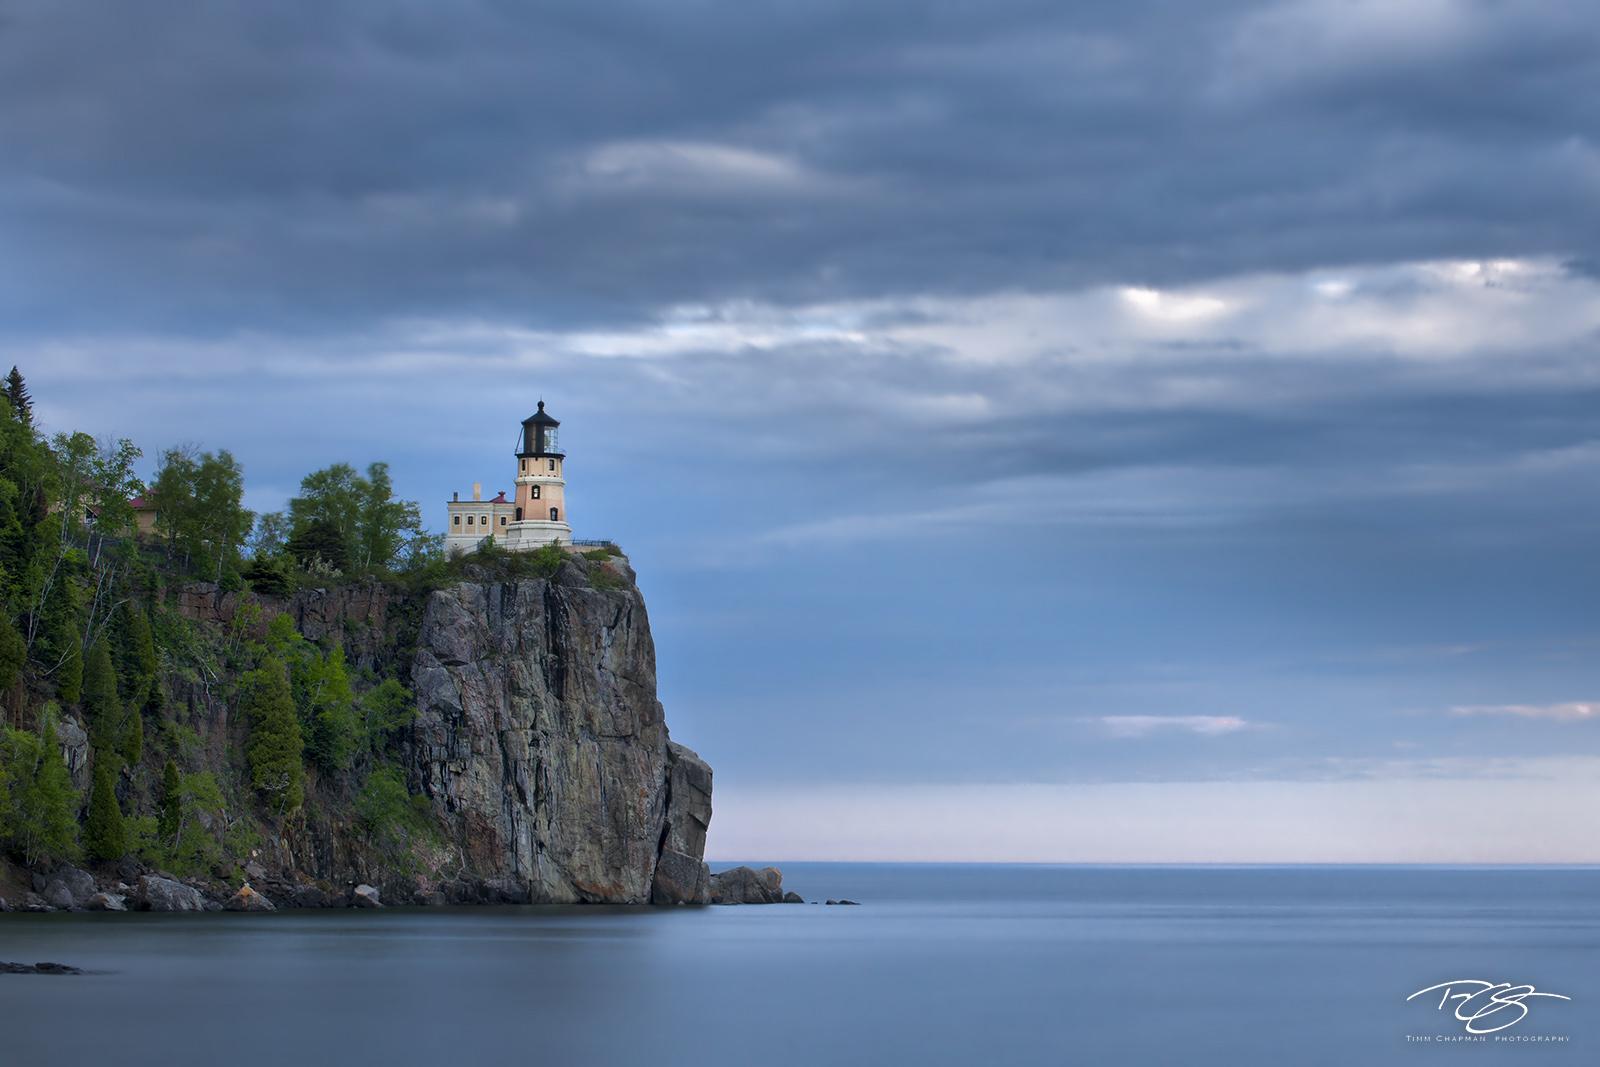 Split Rock lighthouse warns of the rocky coast along Lake Superior's western shoreline